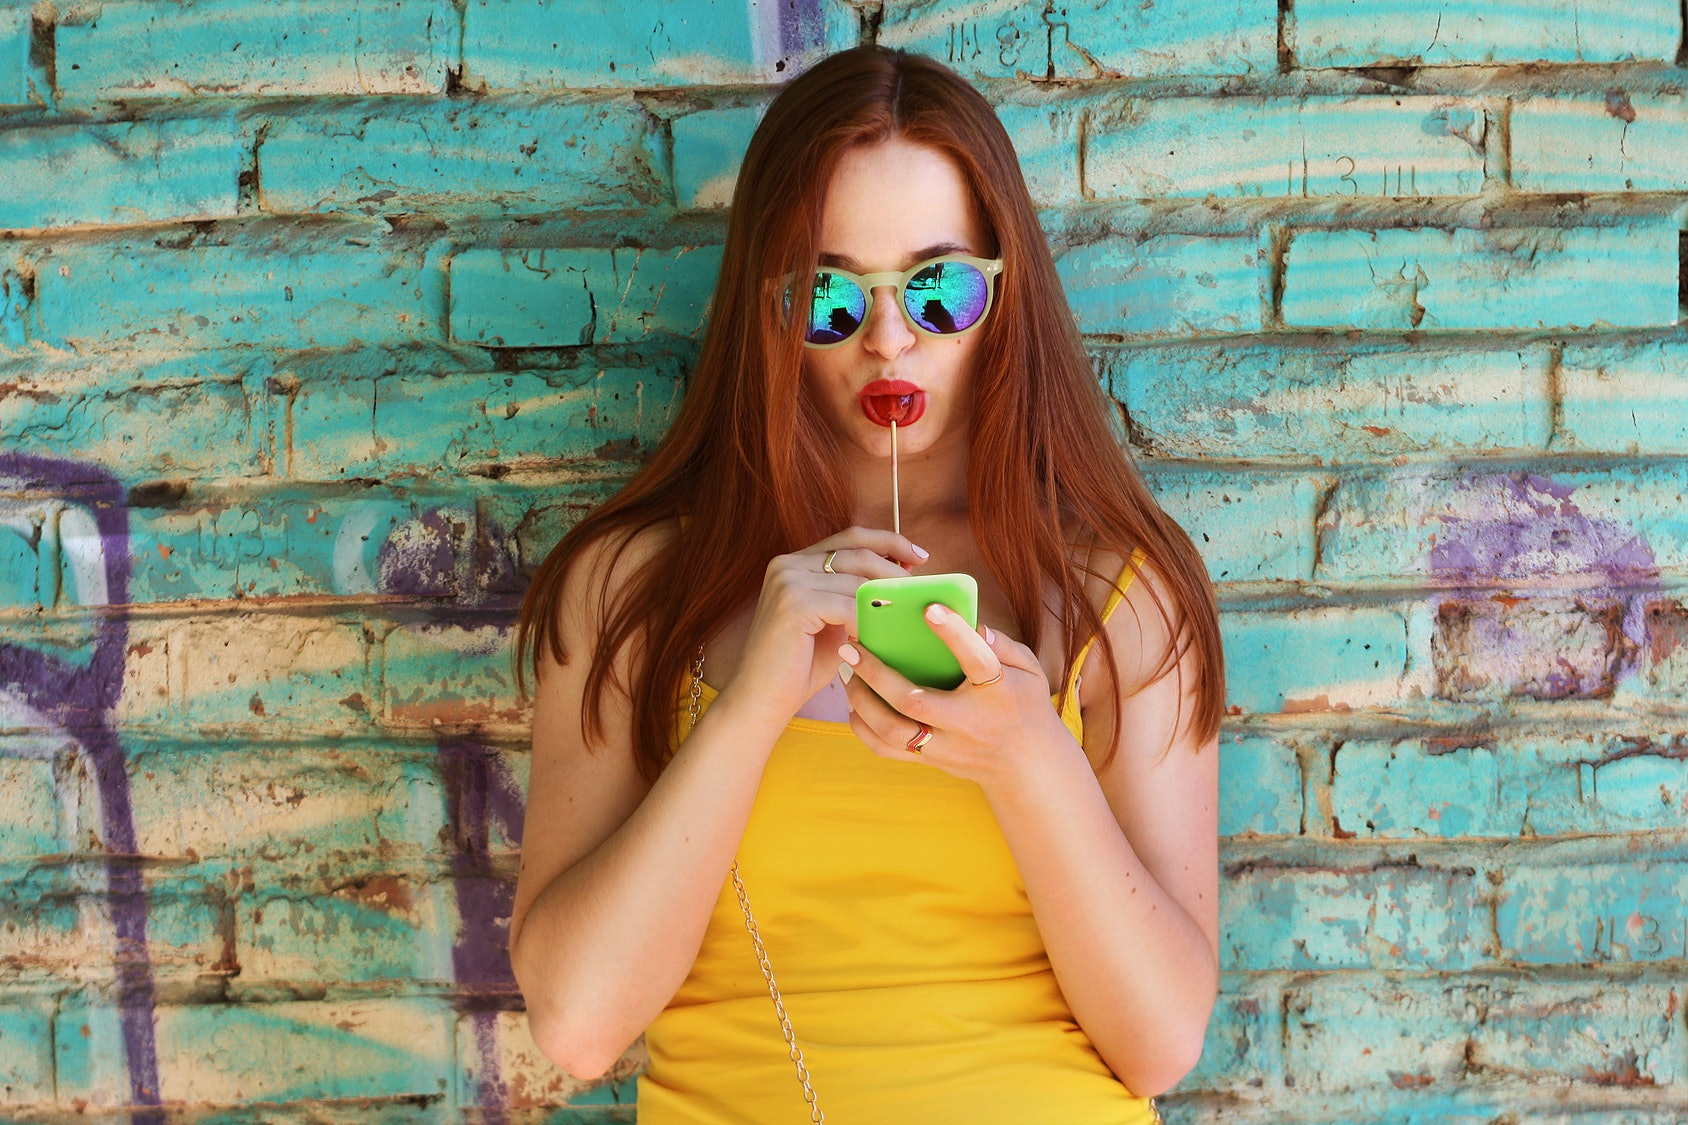 Bedste online dating site for hipsters